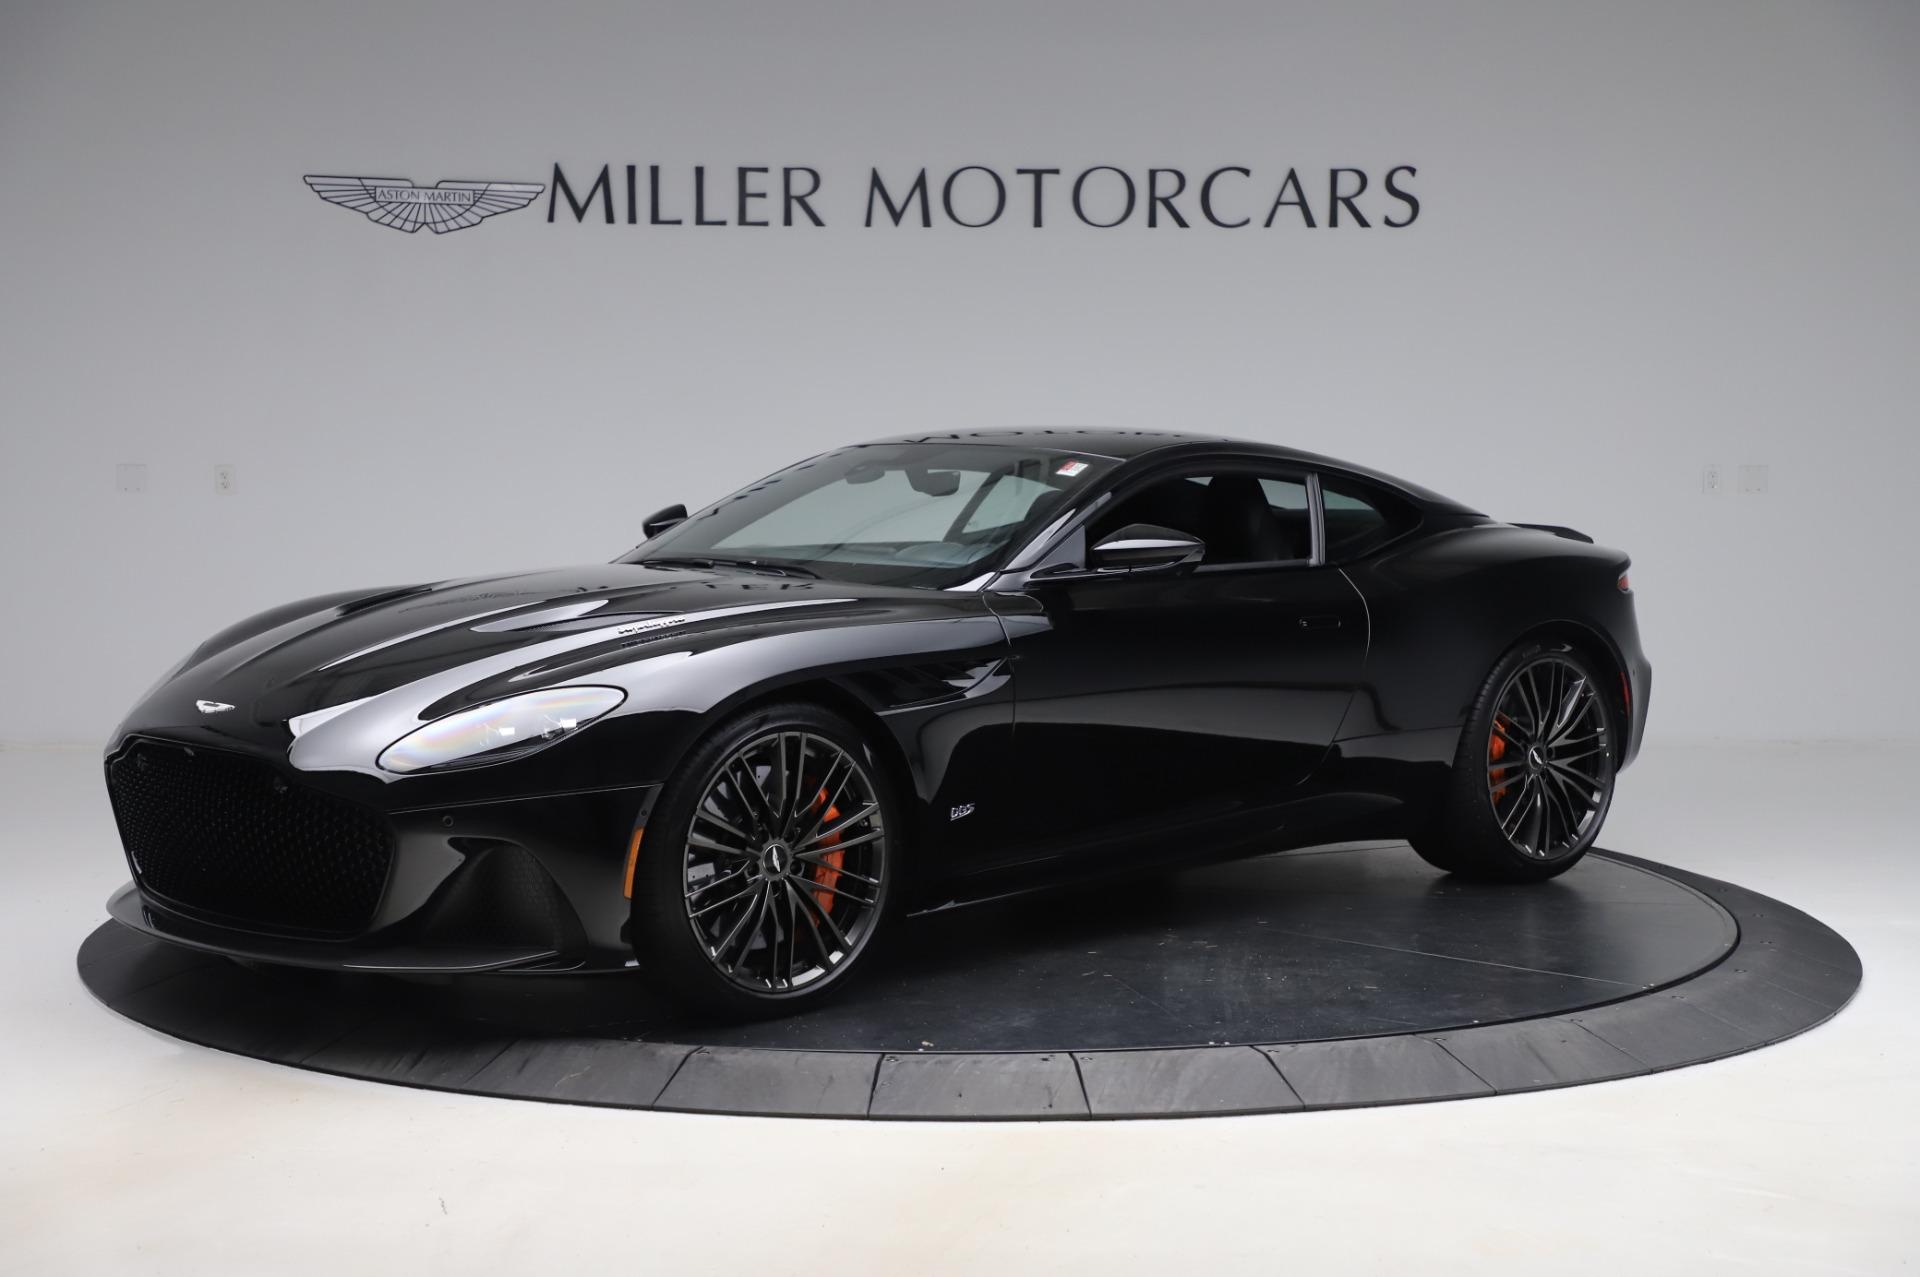 New 2020 Aston Martin DBS Superleggera for sale $328,786 at Rolls-Royce Motor Cars Greenwich in Greenwich CT 06830 1